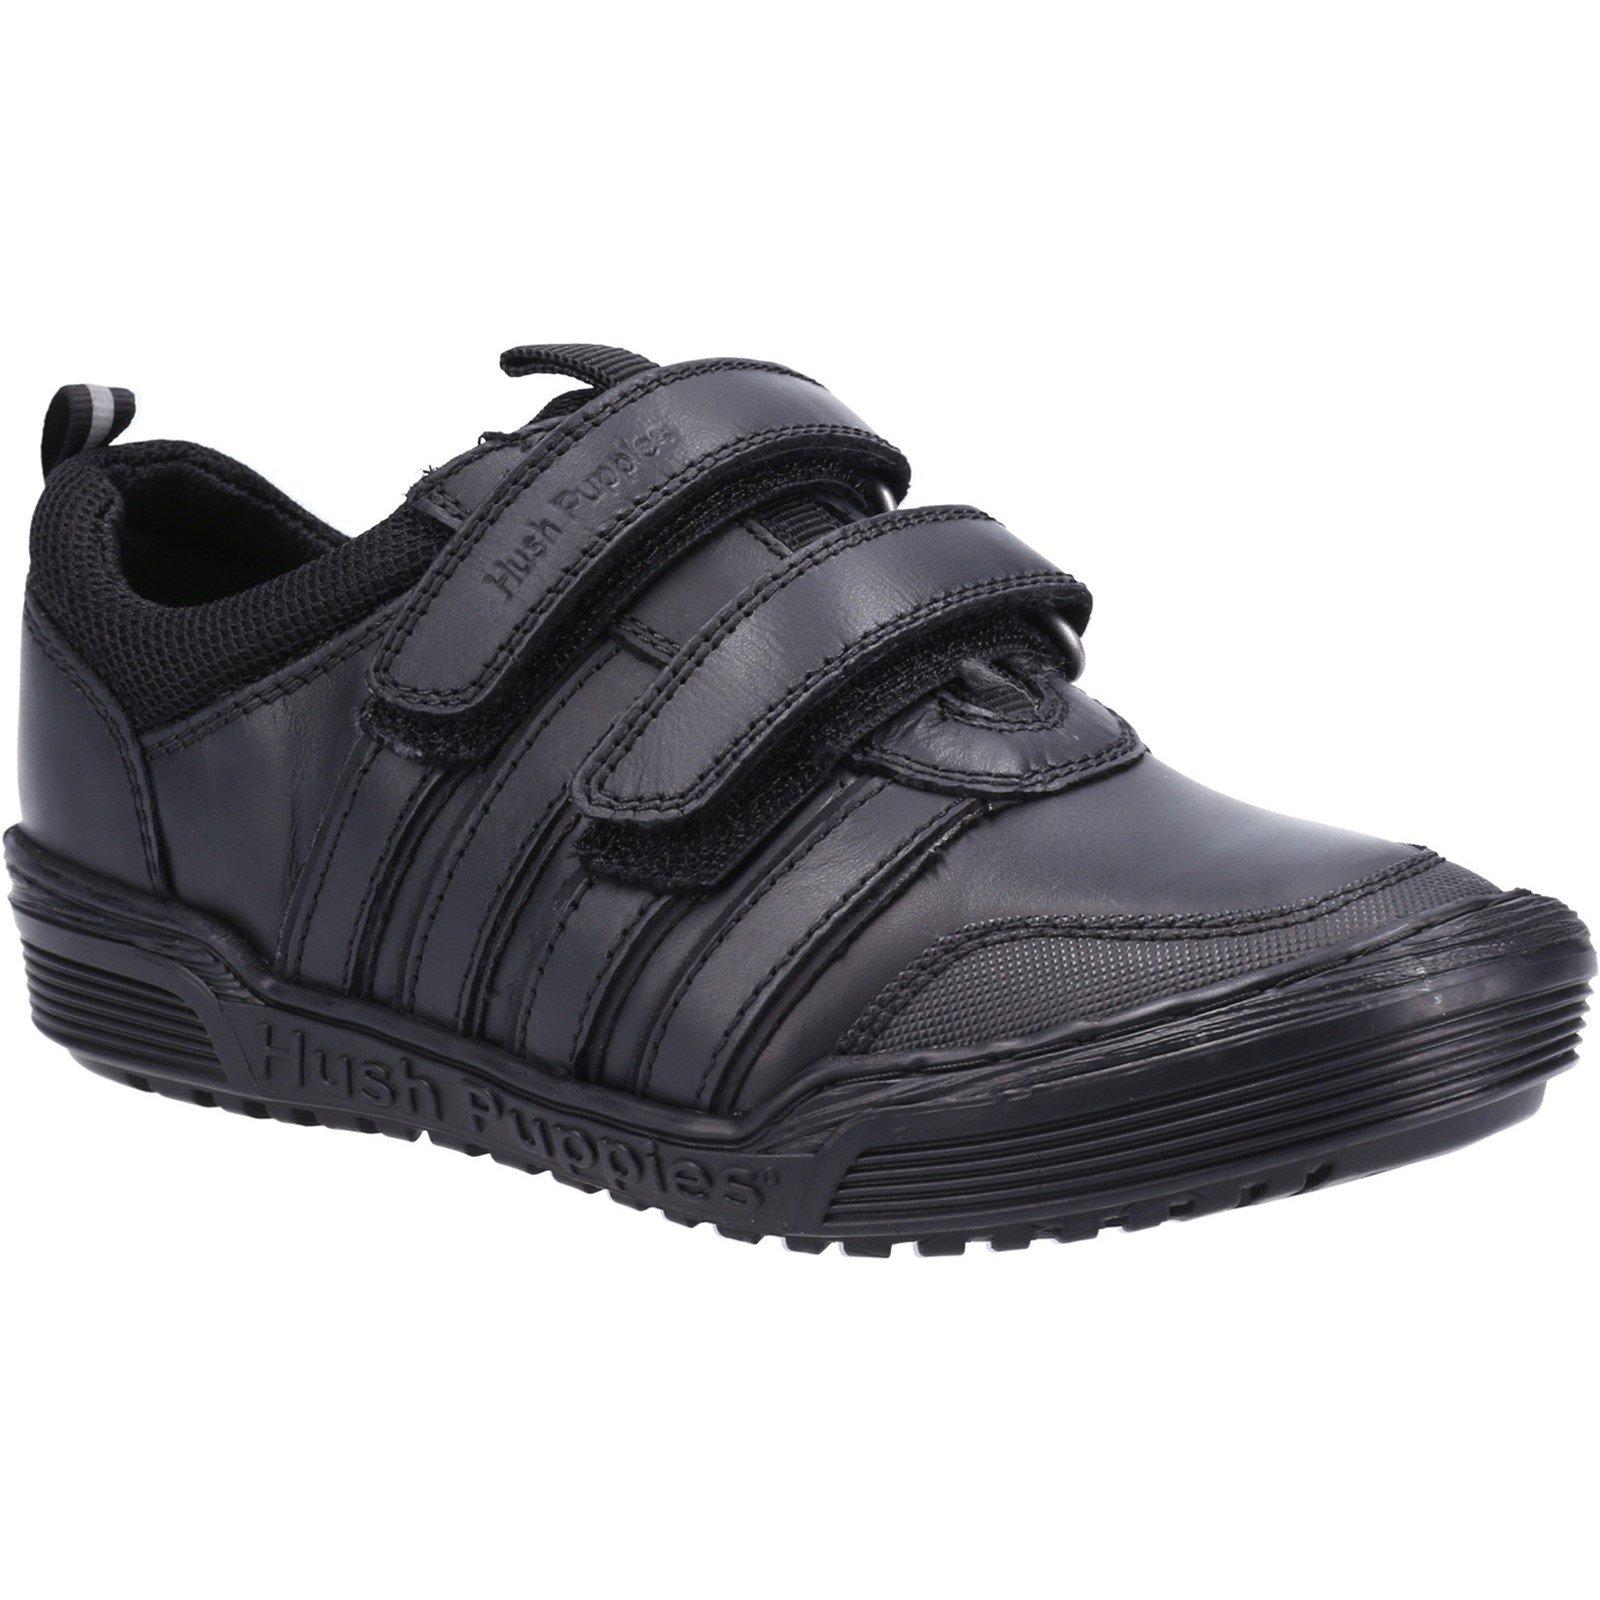 Hush Puppies Kid's Jake School Shoe Black 32736 - Black 10